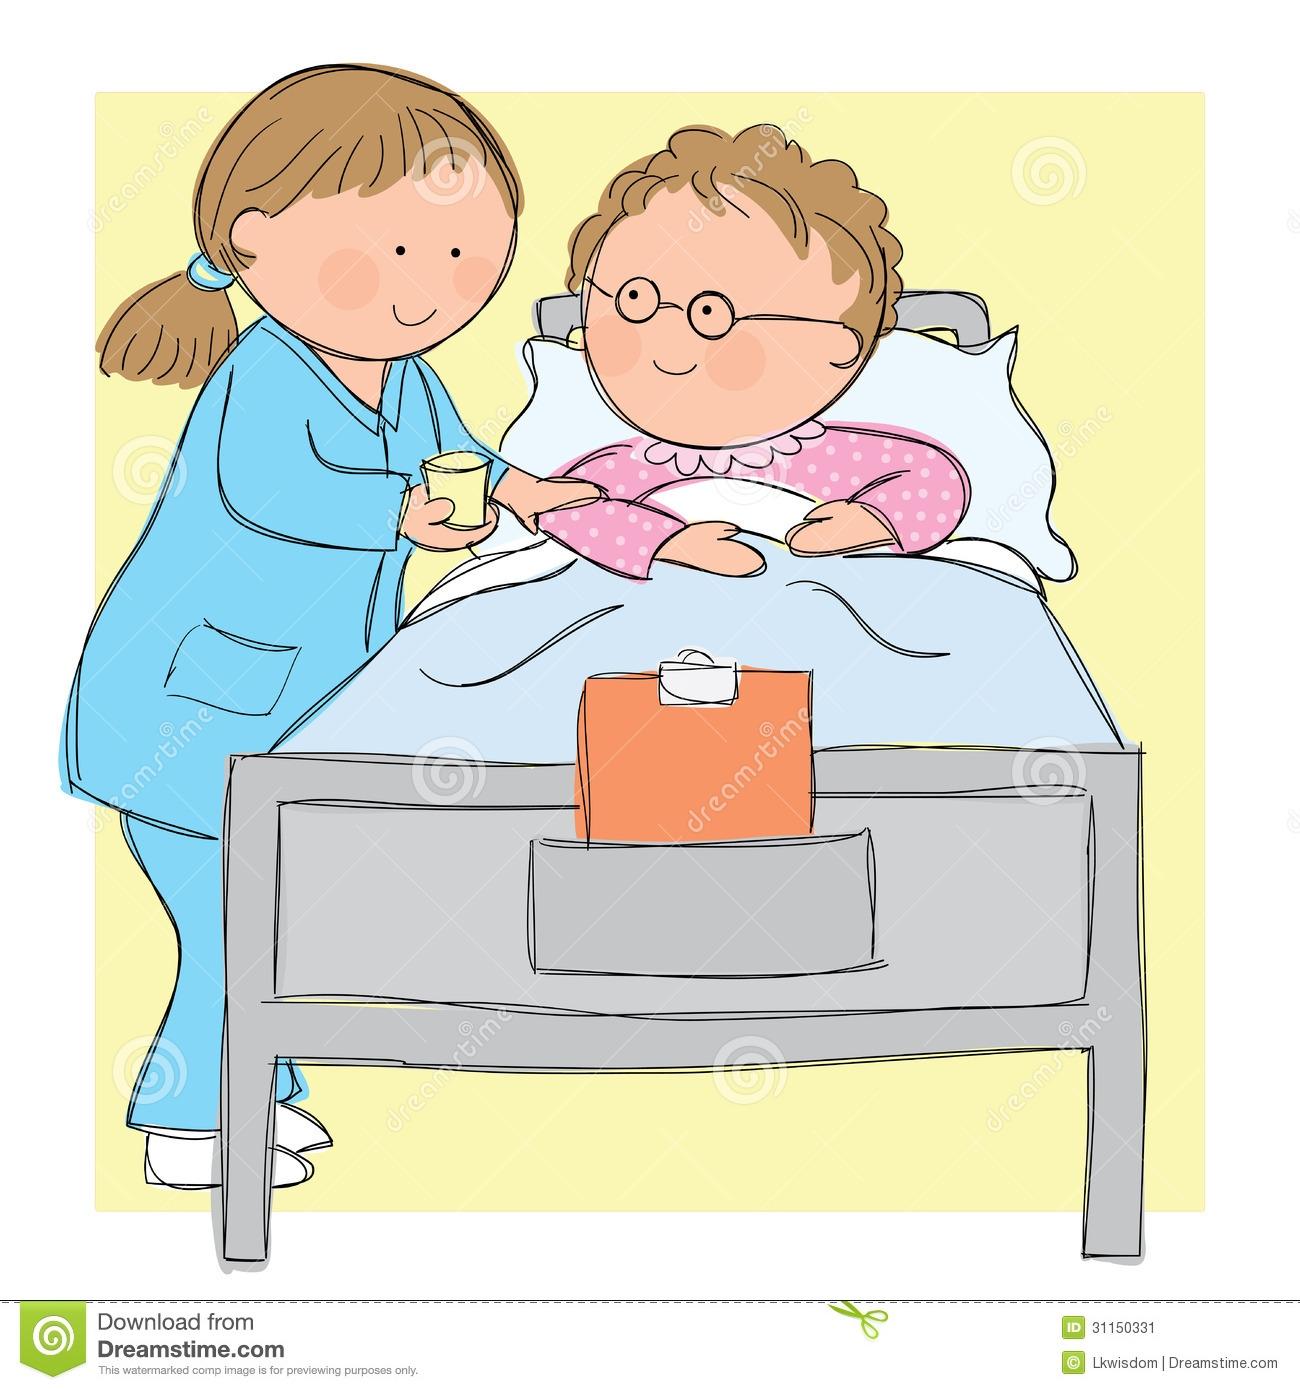 Nurse clip art library. Caring clipart nursing